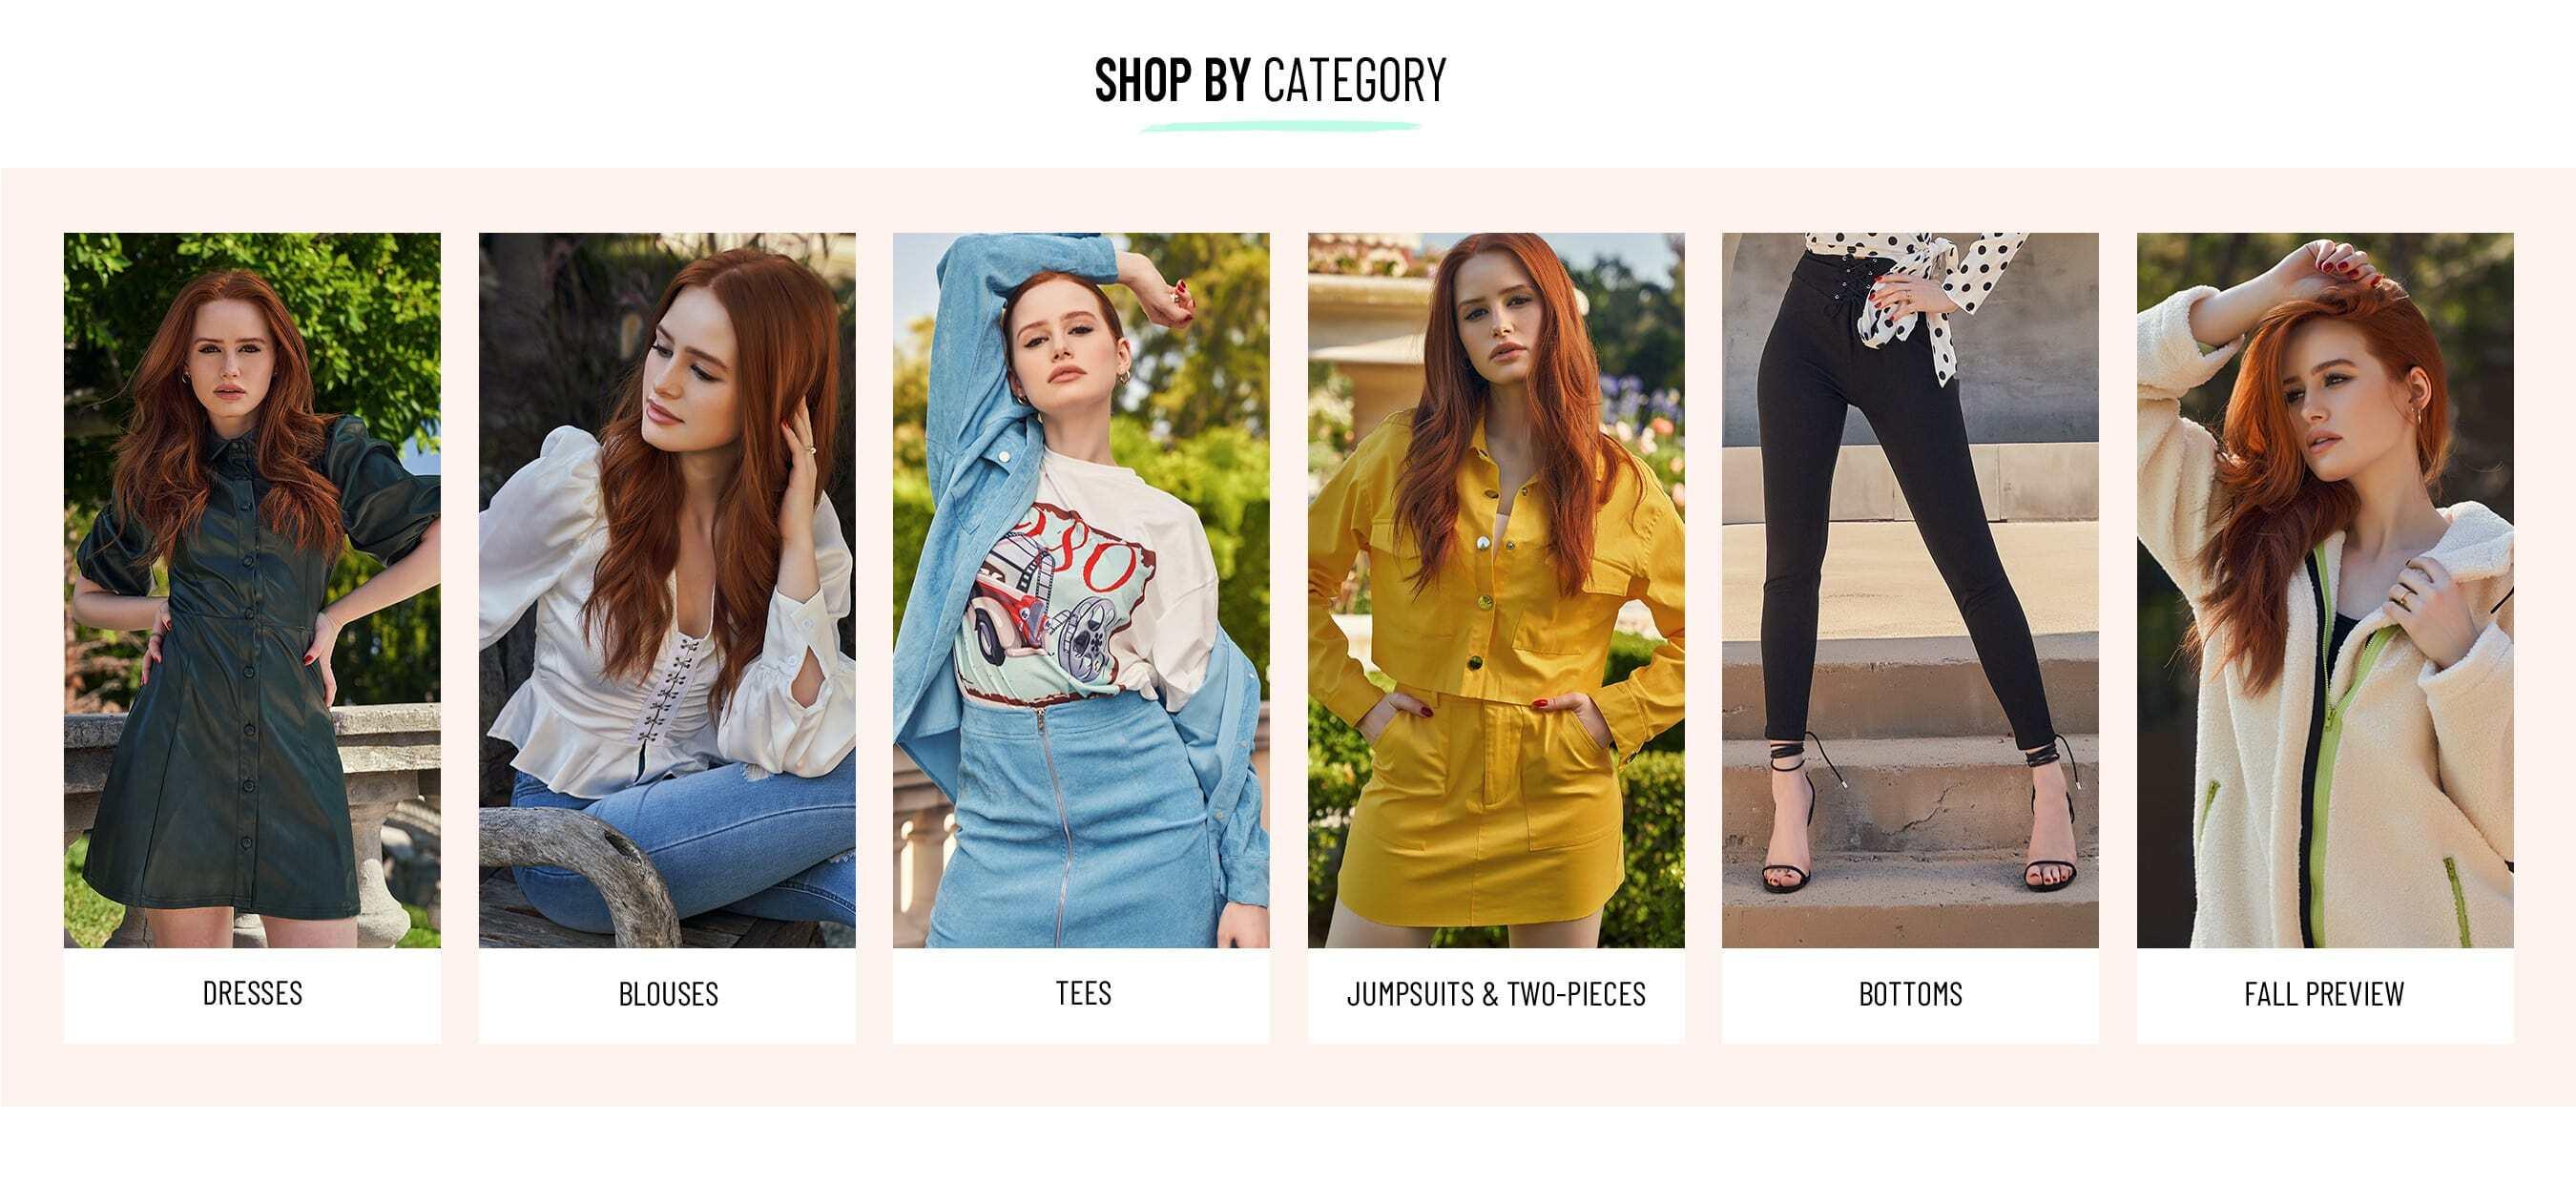 5c7729dc5134e Shop Trendy Women's Fashion | SHEIN